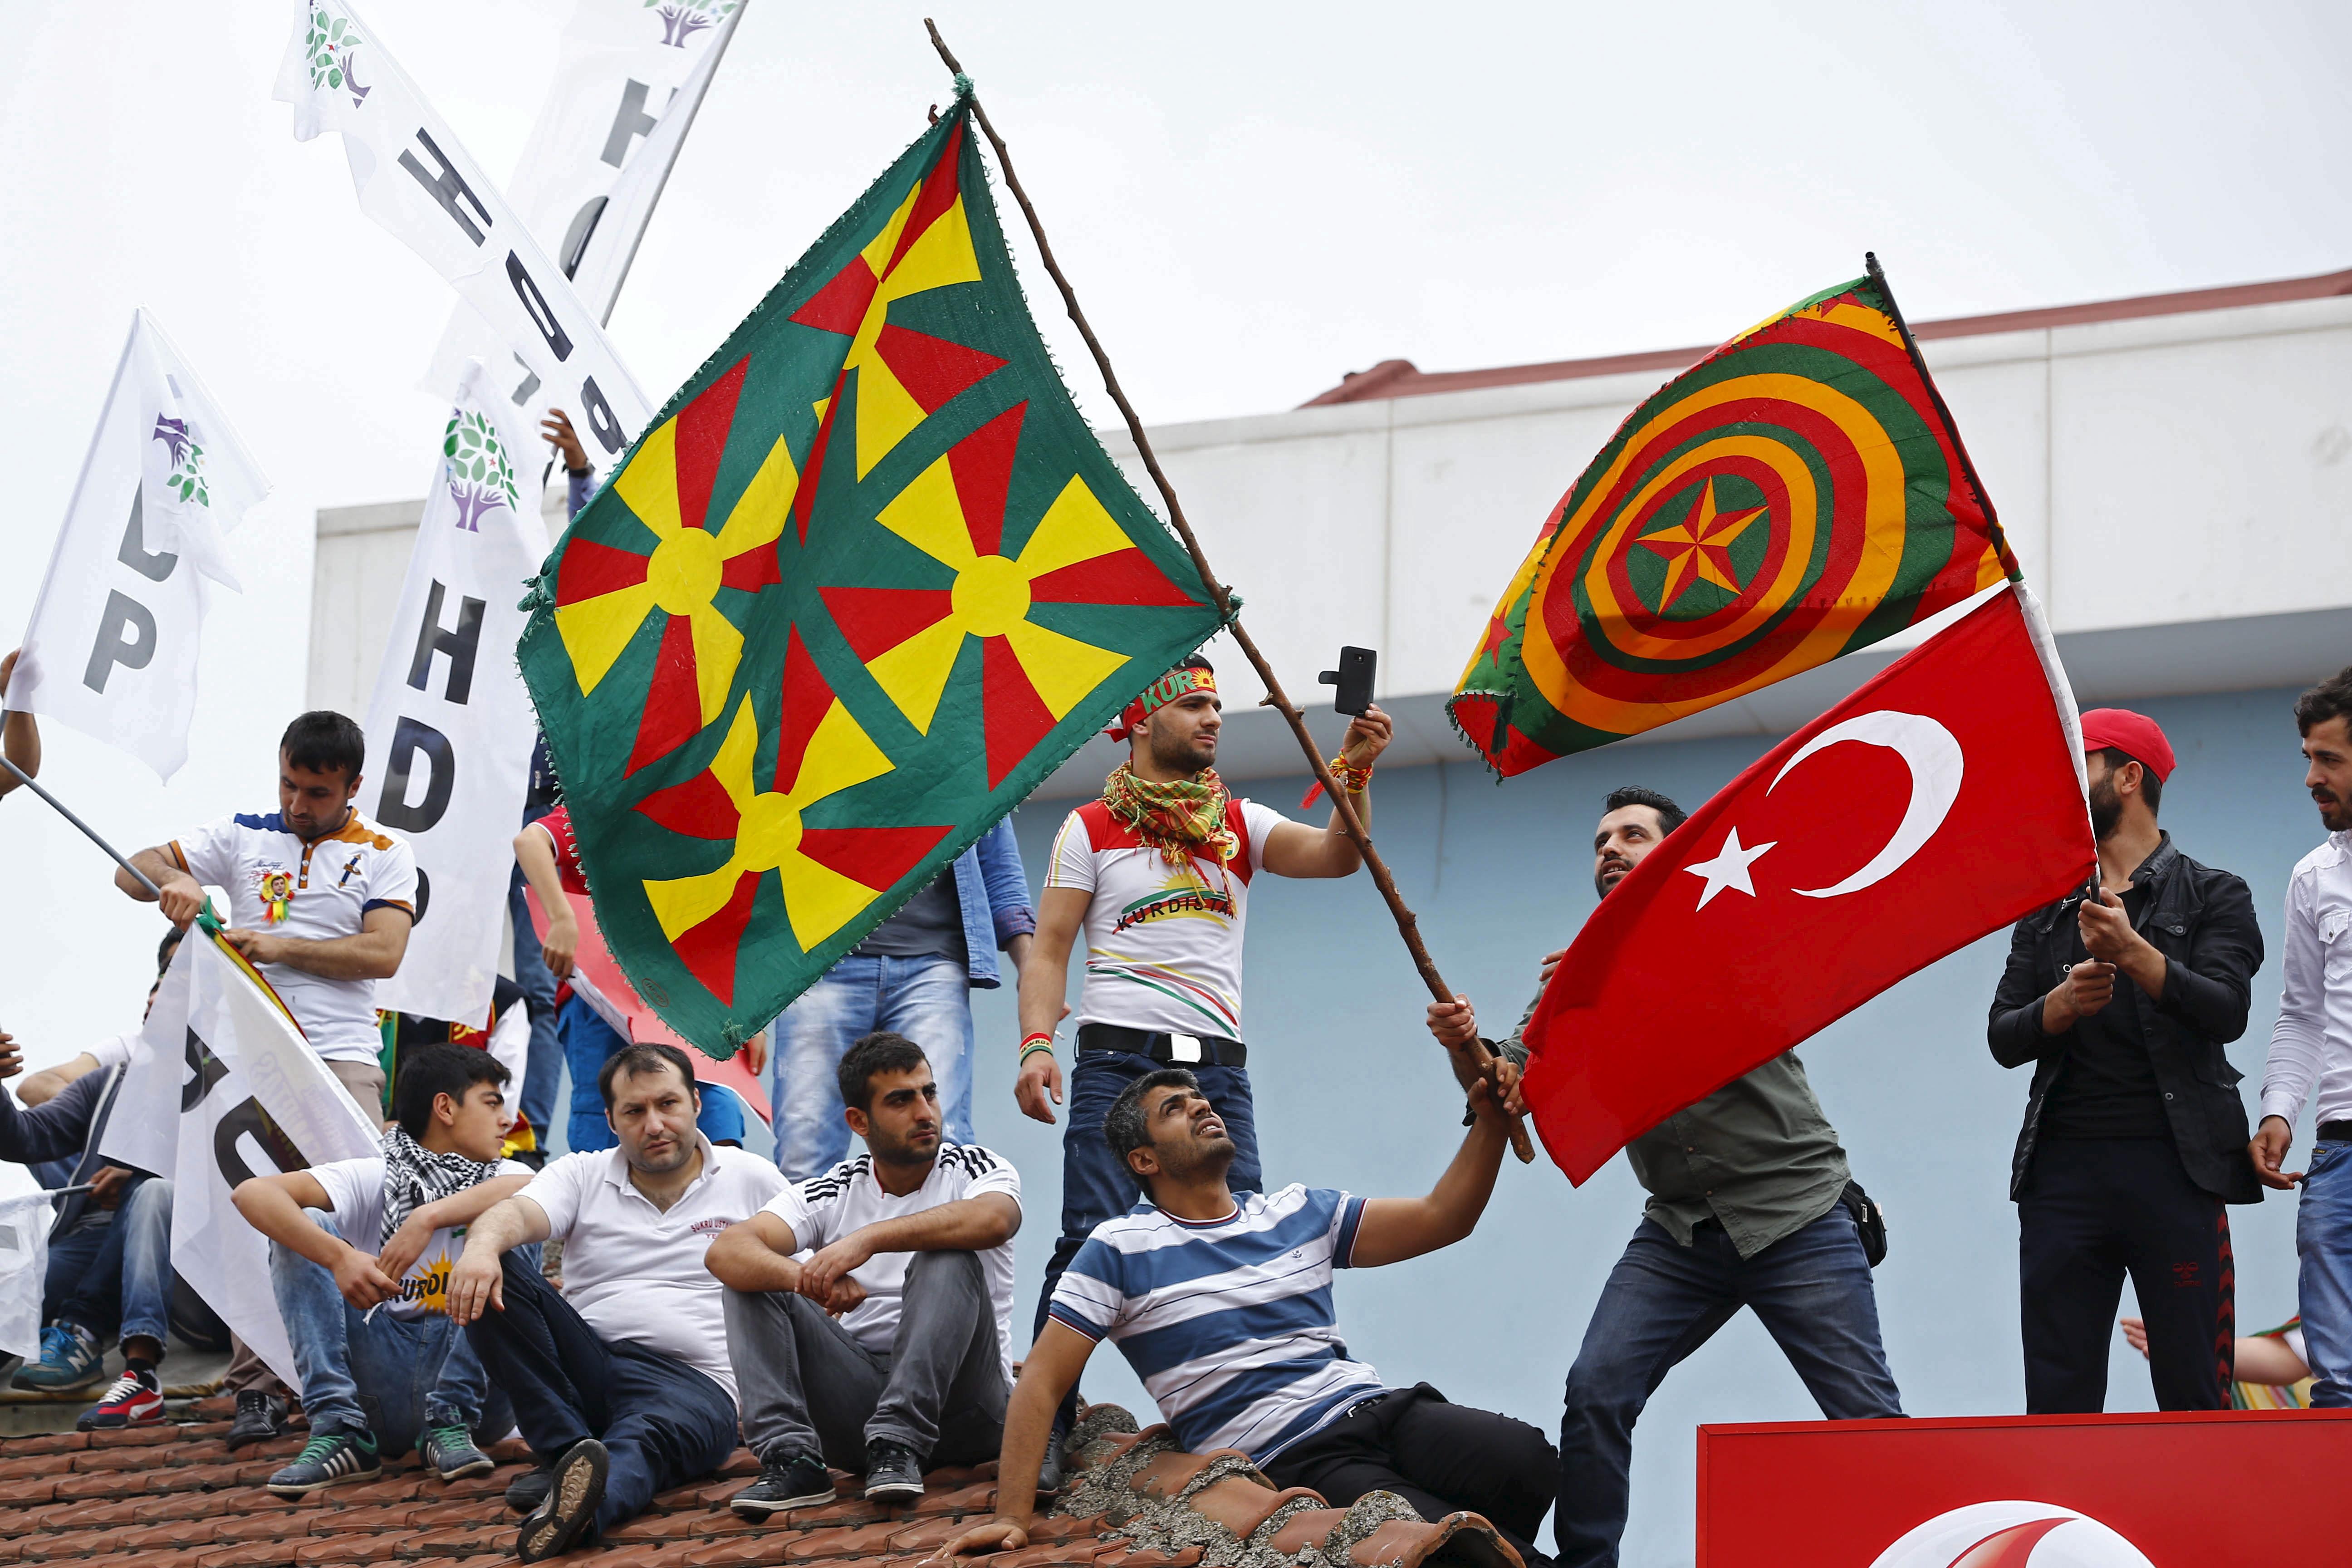 turkish kurdish nationalism During the mandate period, treatment of kurds varied from substantial autonomy to severe discrimination within turkey, kurdish nationalism.